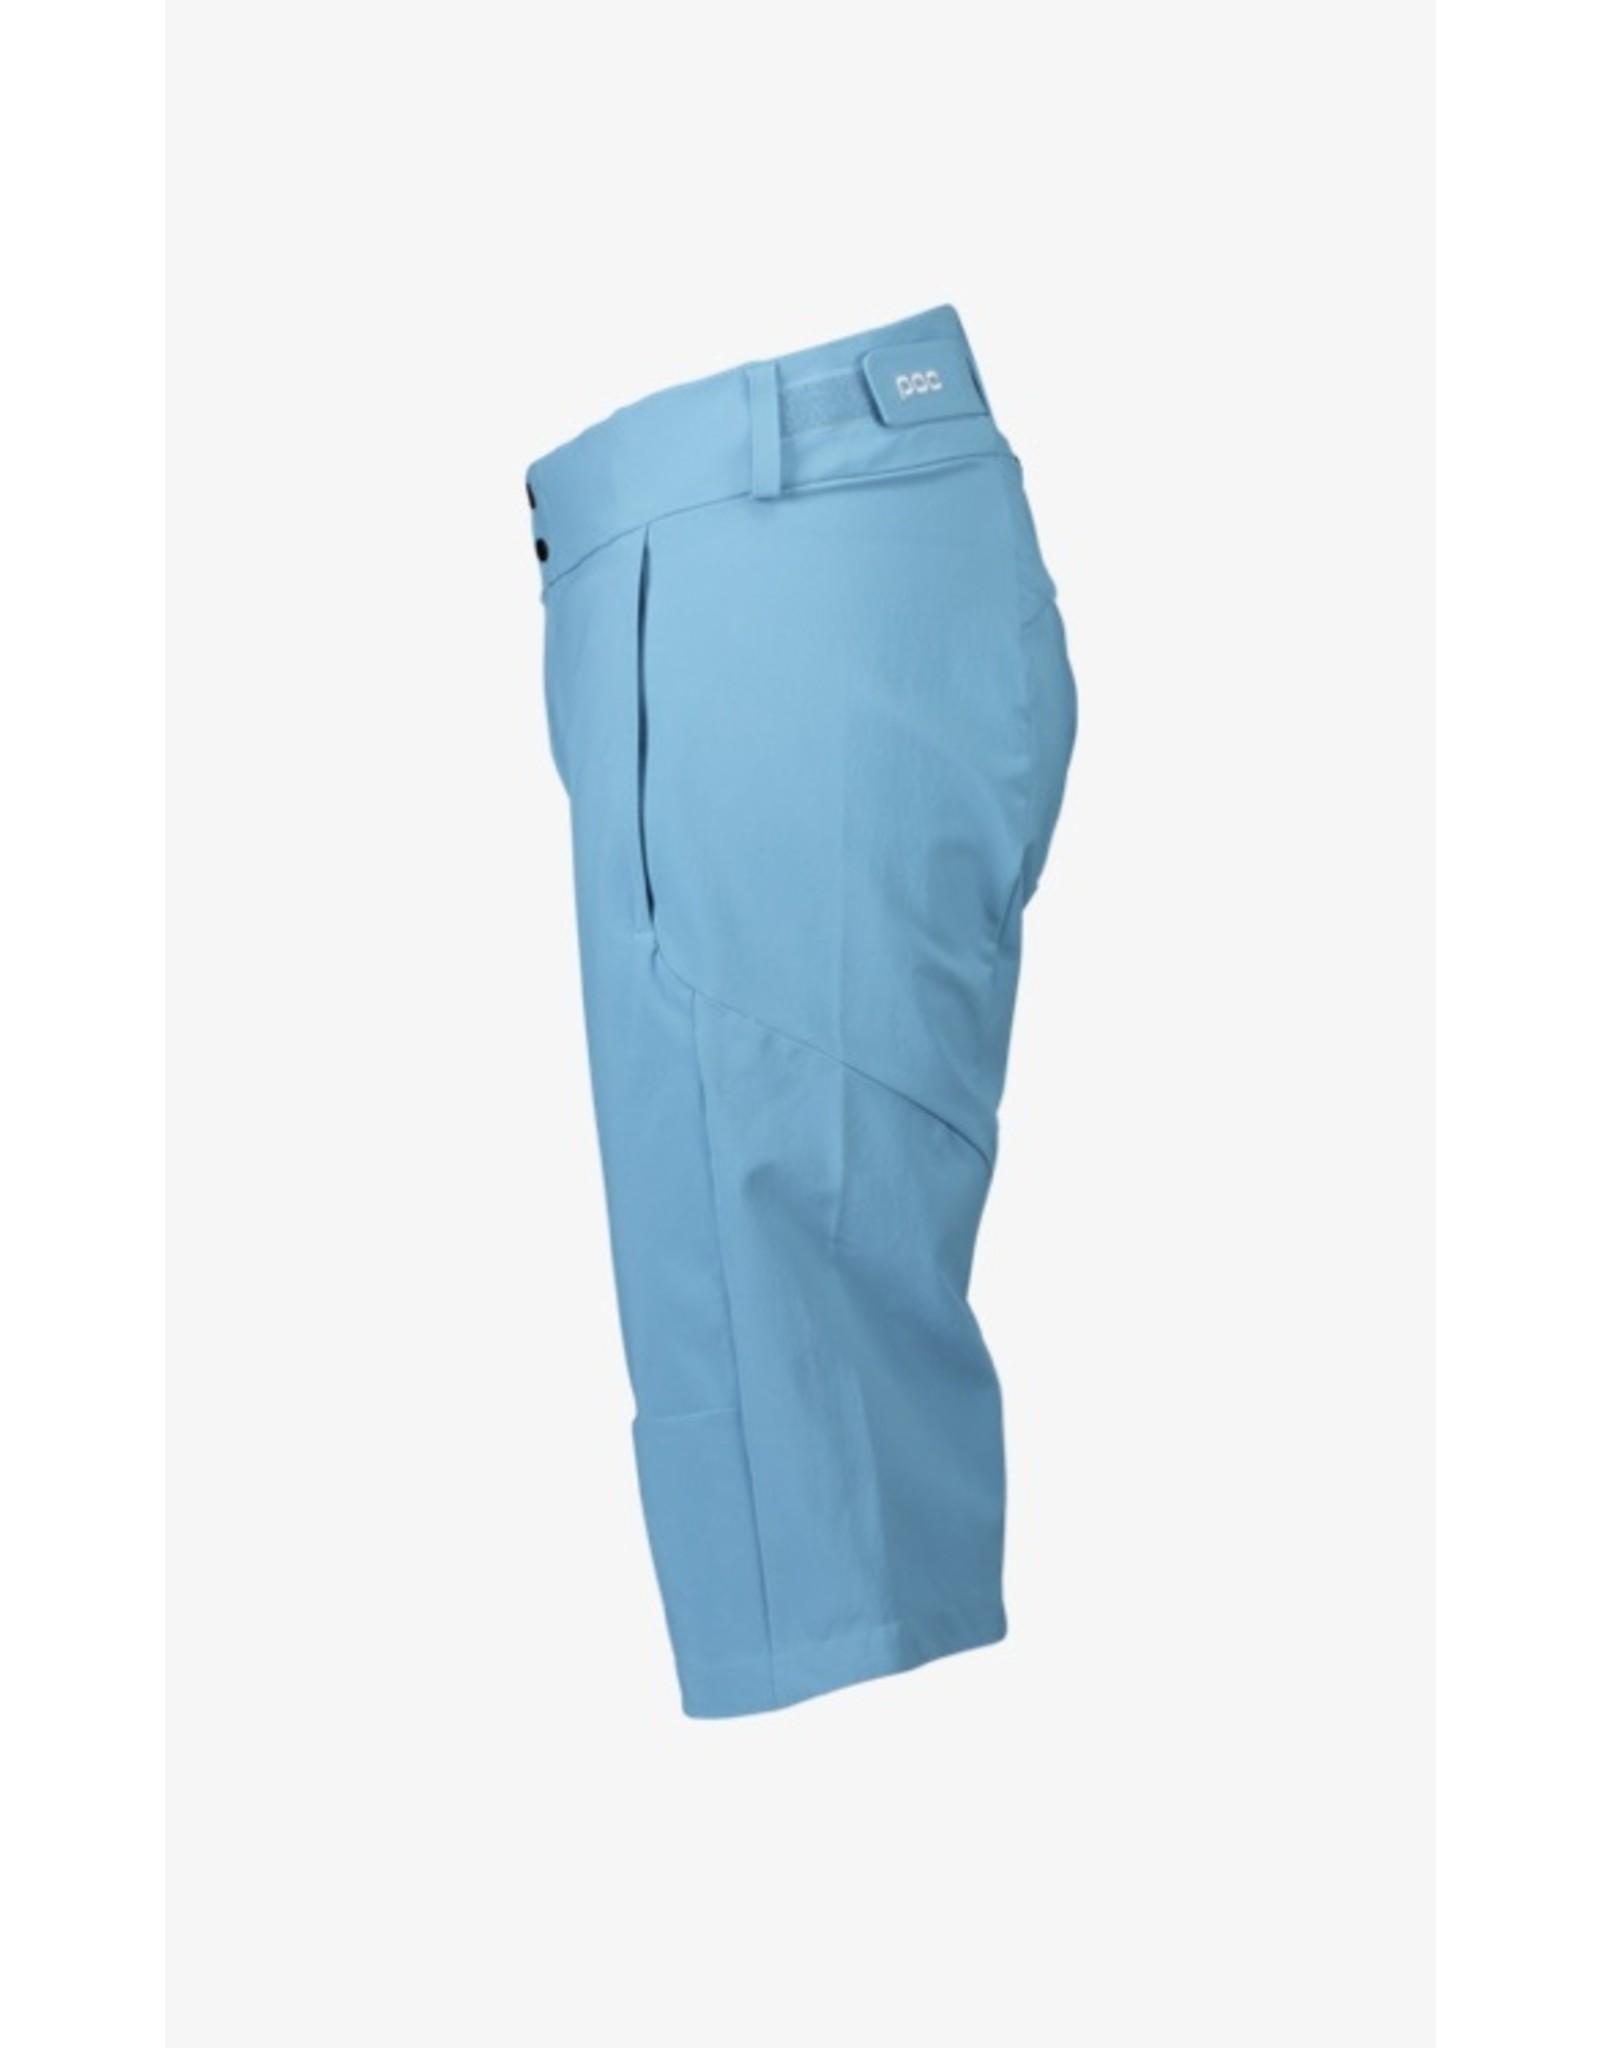 POC POC Essential Women's MTB Shorts Light Basalt Blue